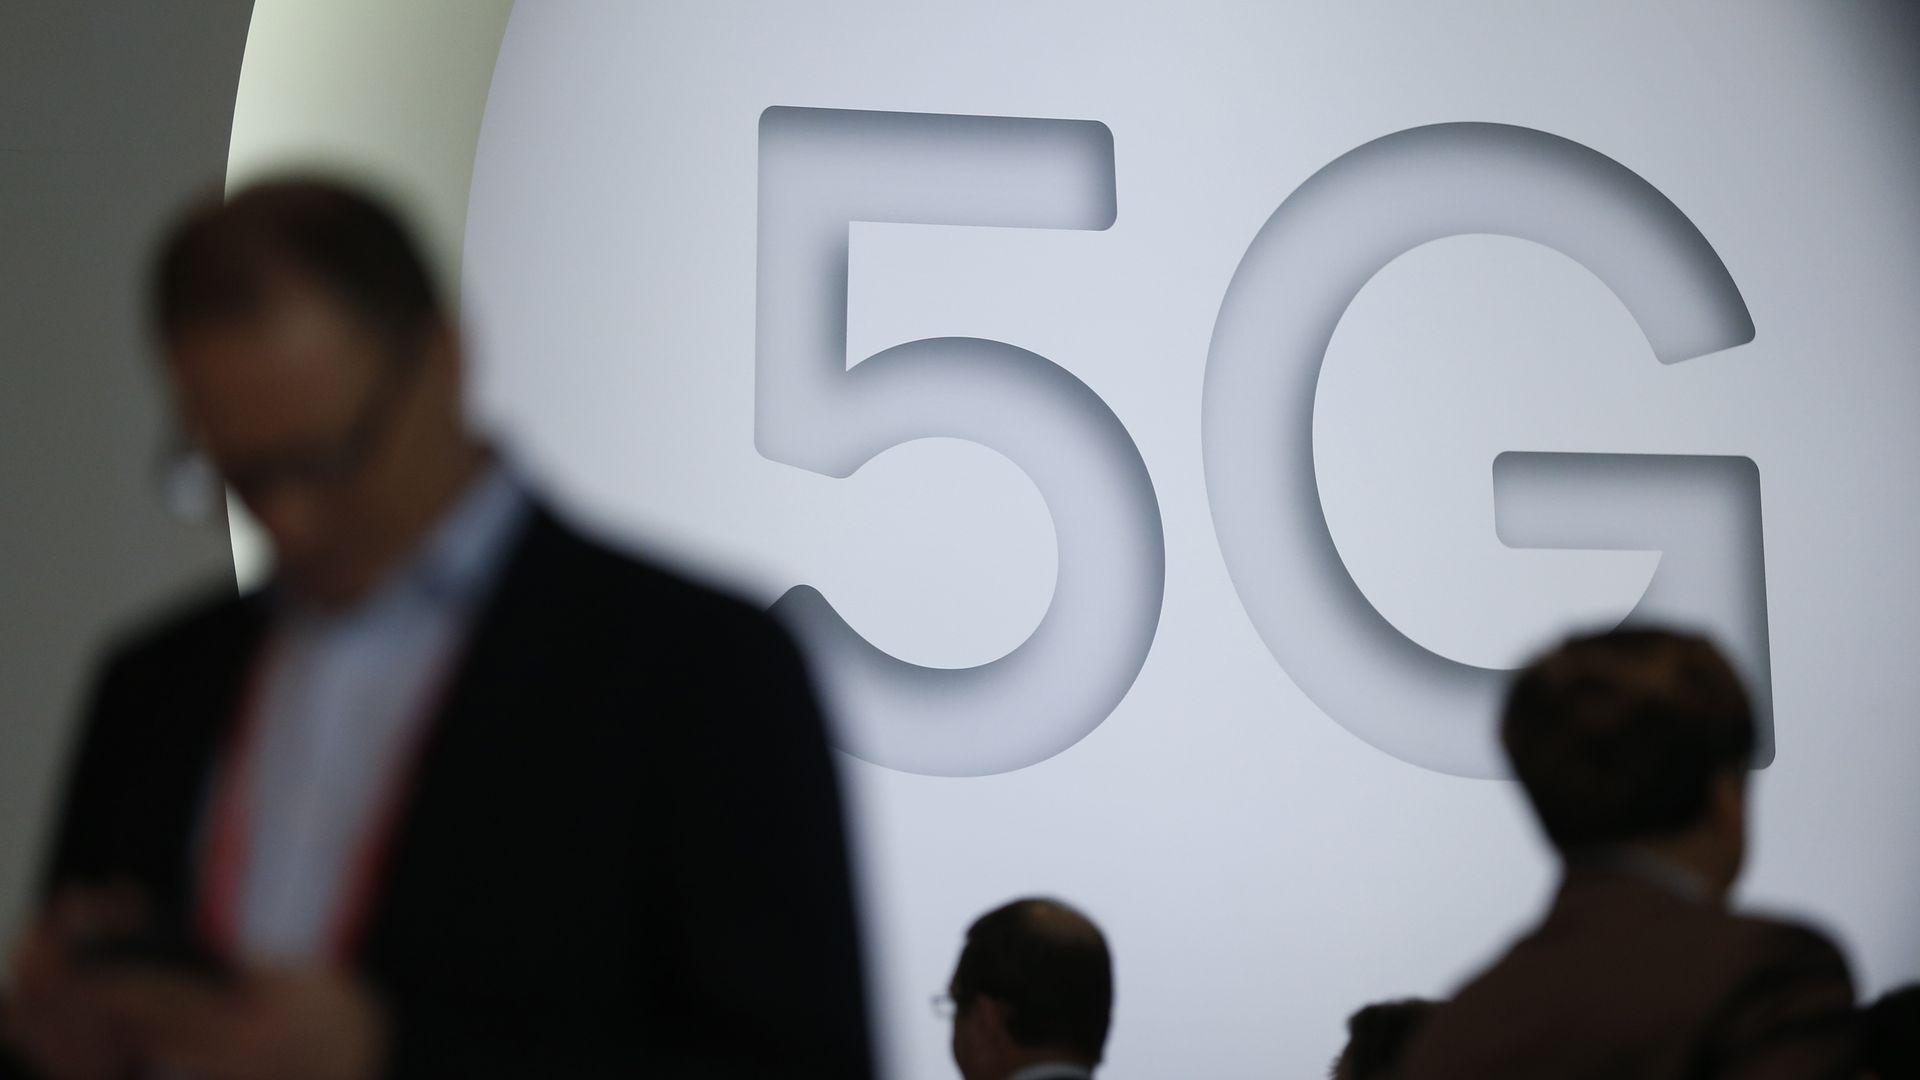 Signage promoting 5G